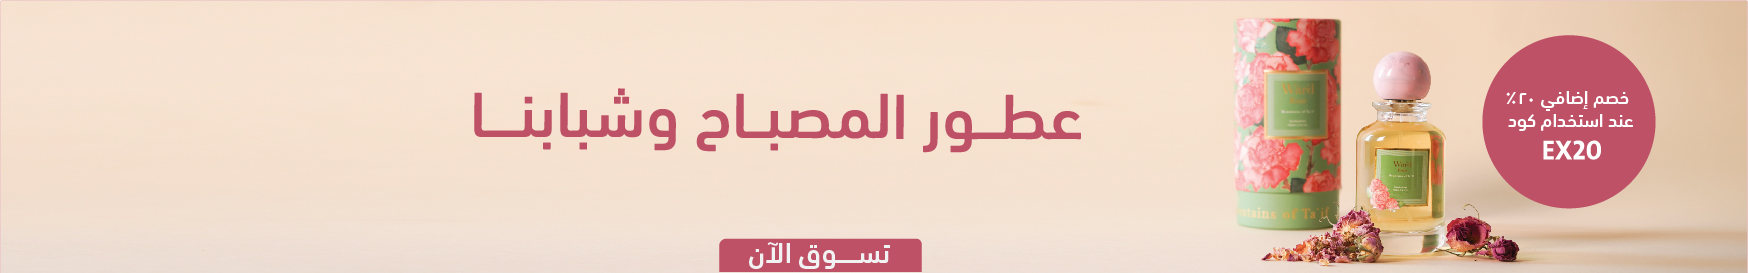 eid_amg_shabauna_web